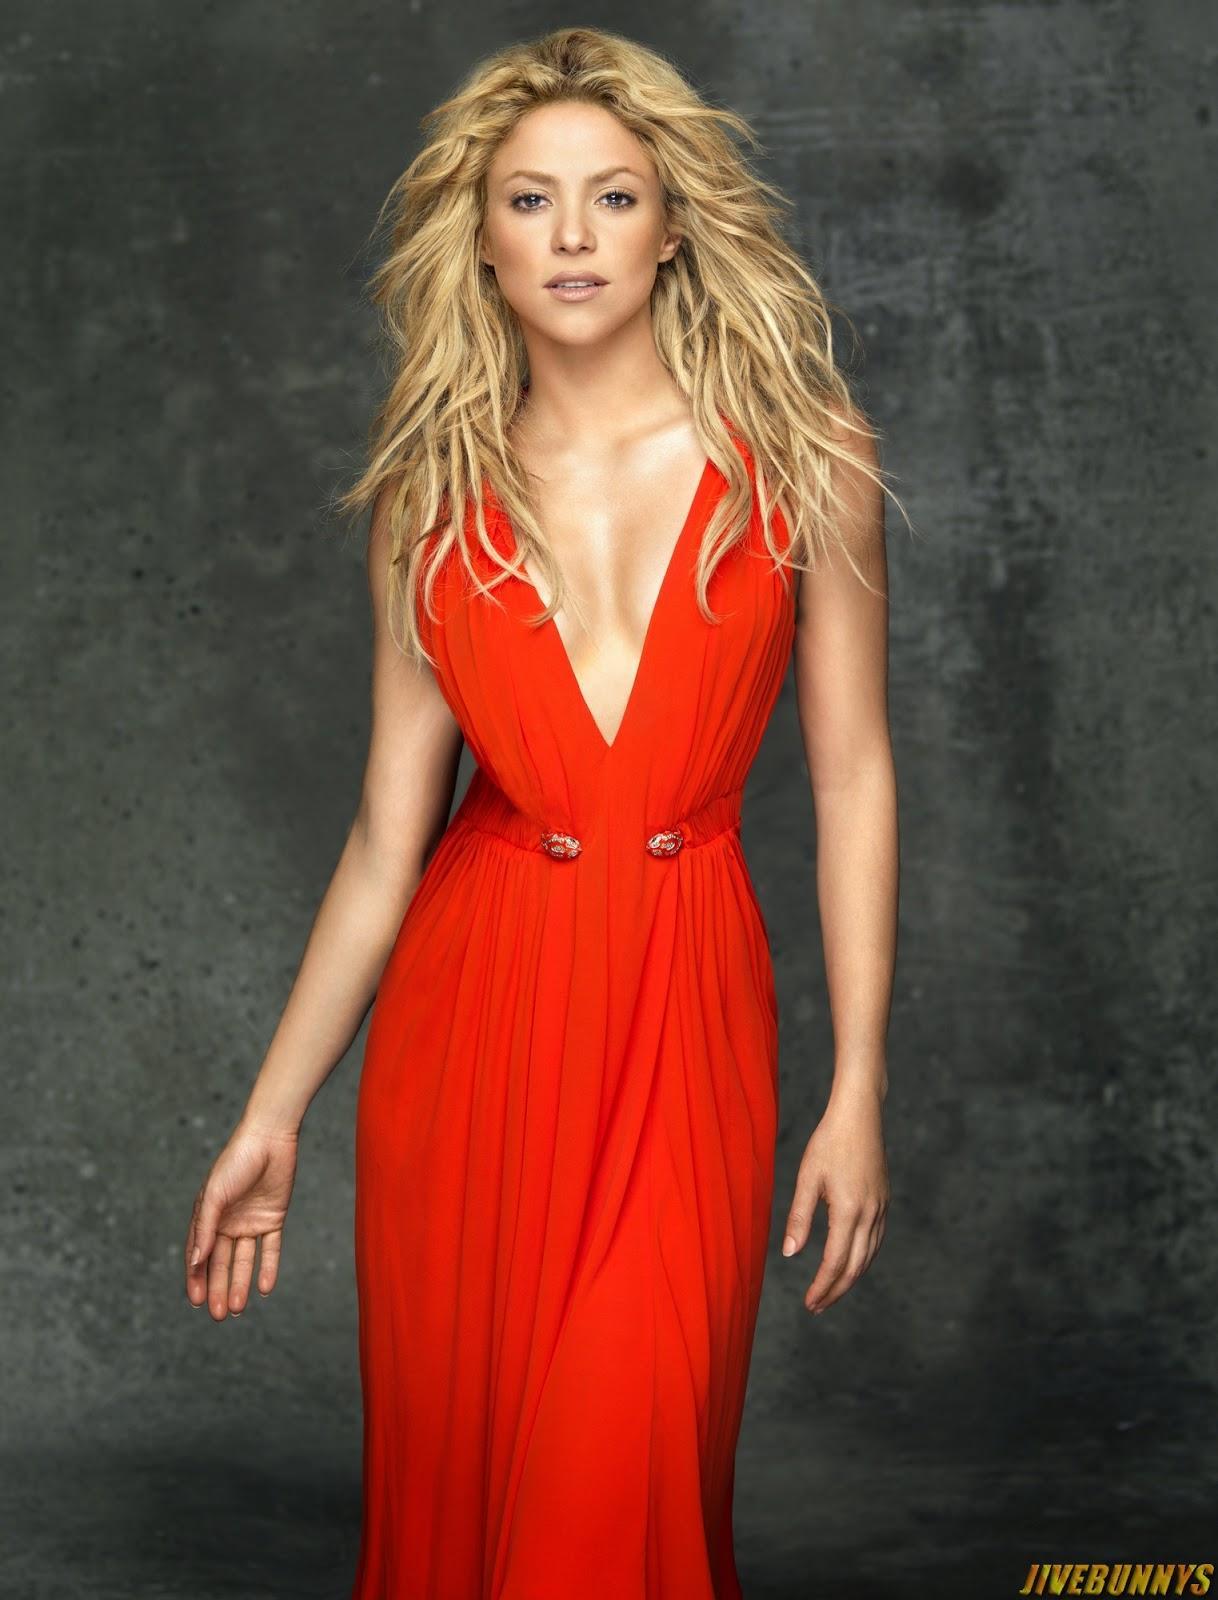 Shakira hot red dress pics